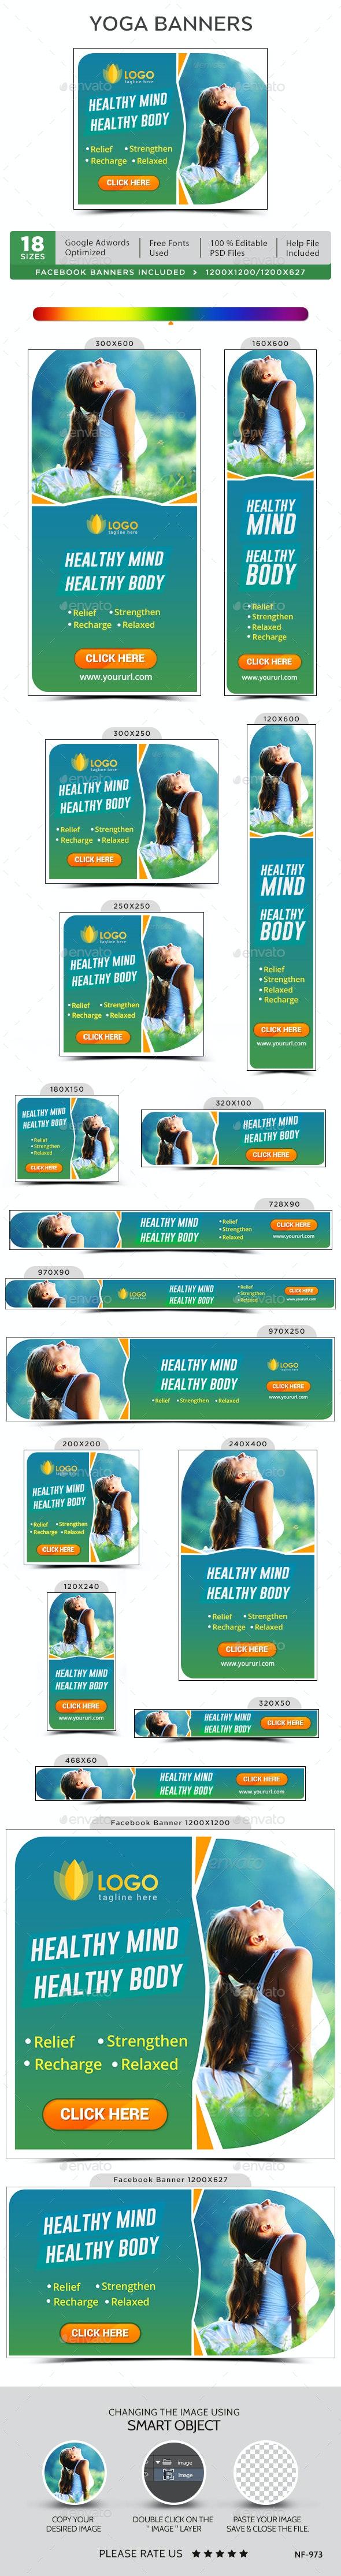 Yoga & Meditation Banners - Banners & Ads Web Elements